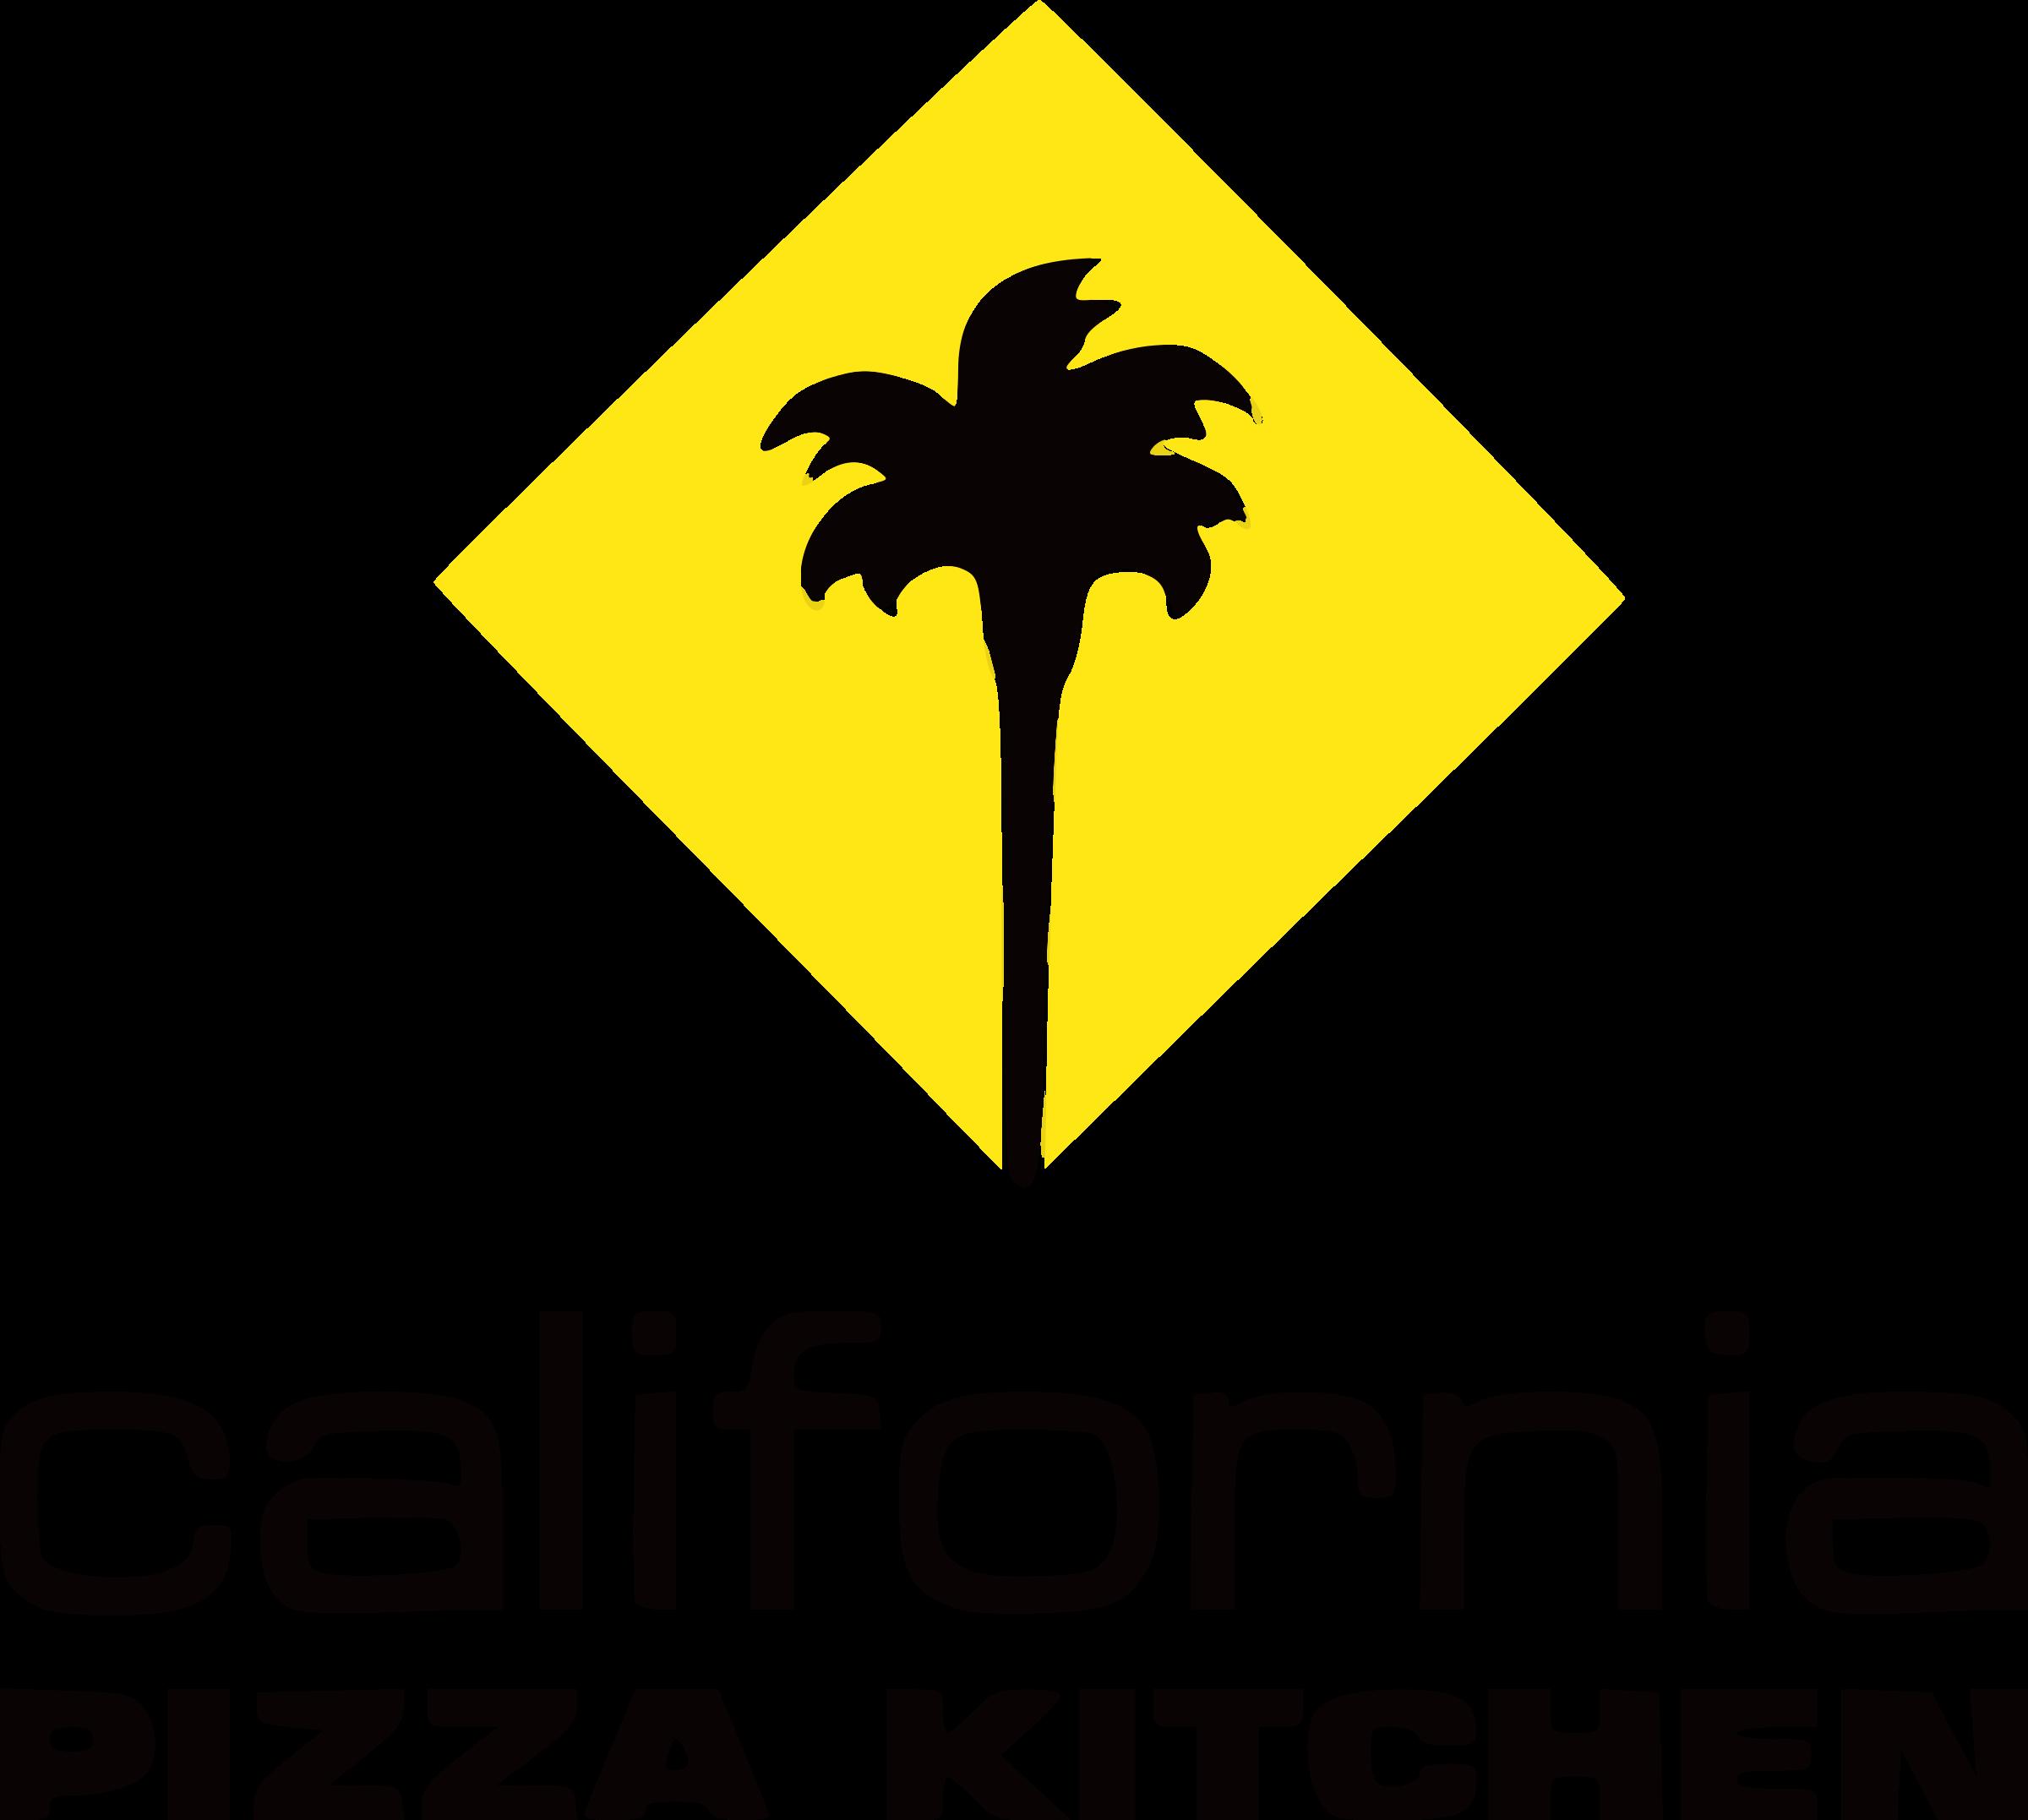 california-pizza-kitchen-1-logo-png-transparent.png